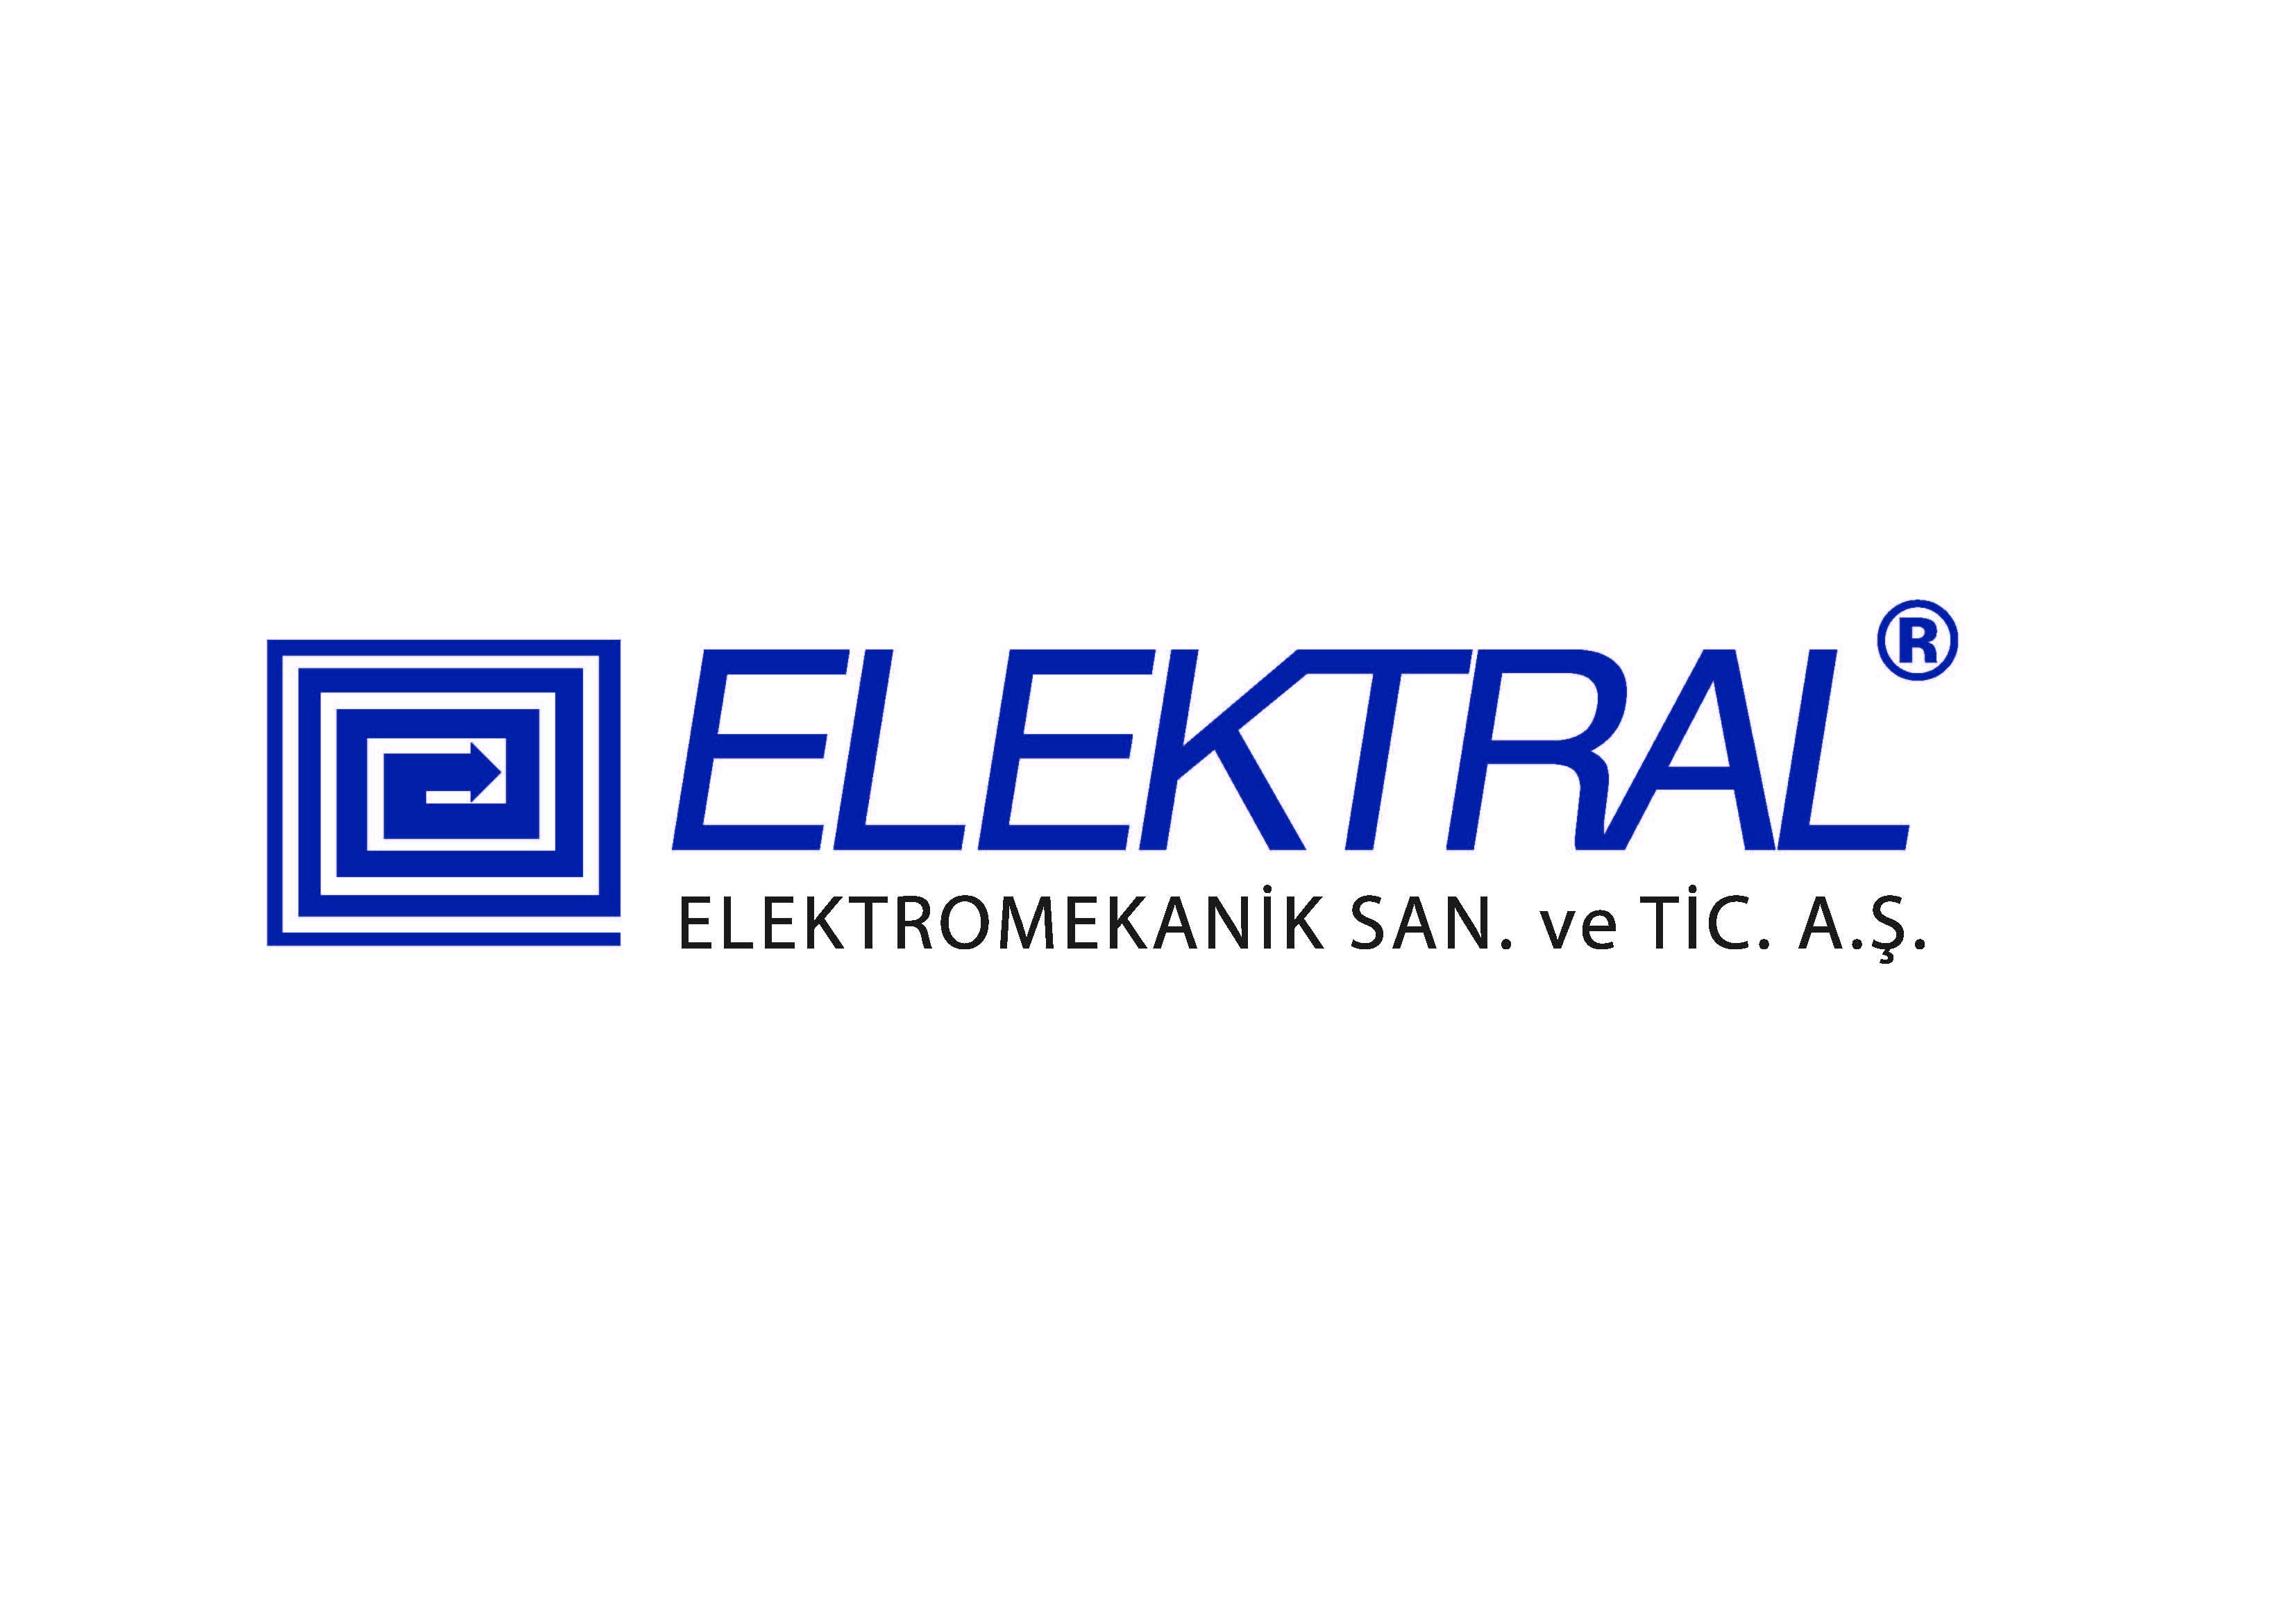 Elektral Elektromekanik Sanayi ve Ticaret A.Ş.